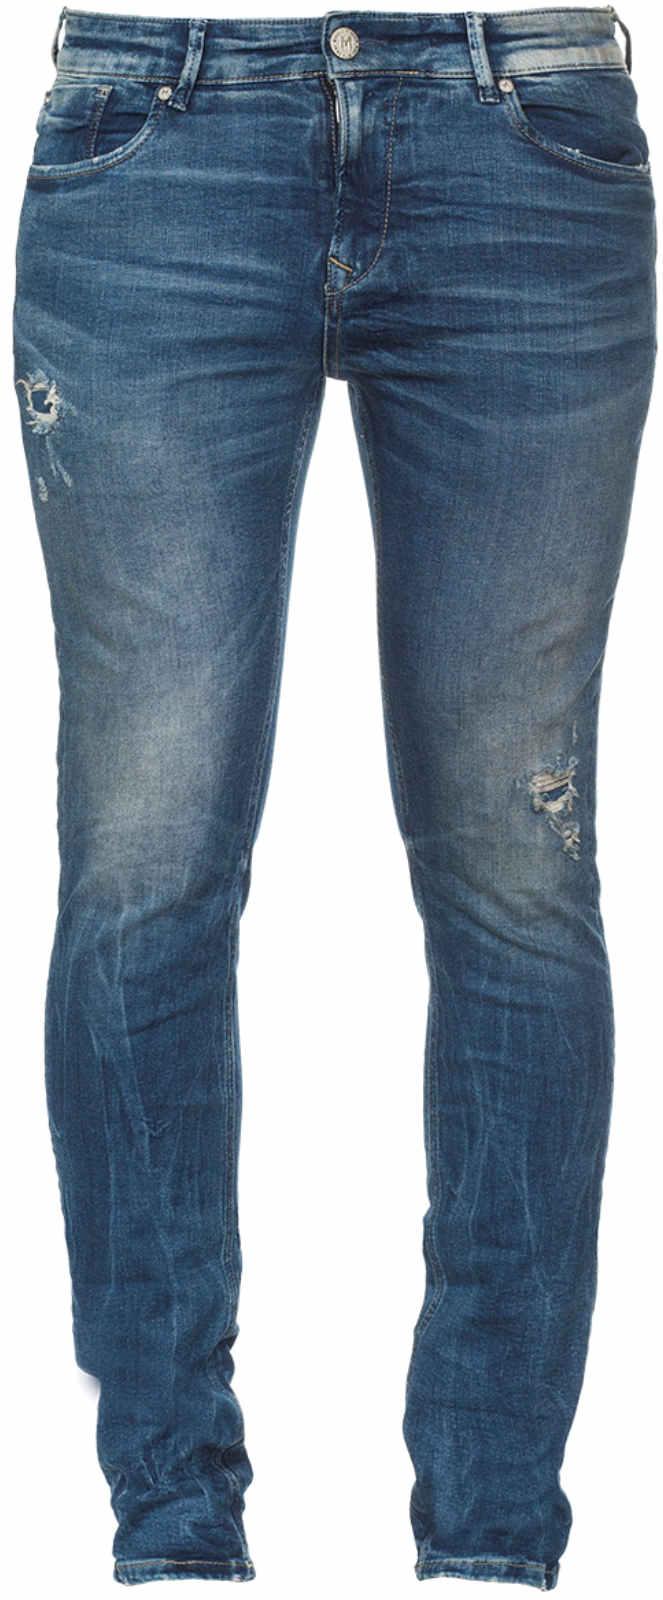 Mod Extra Marcel Herren slim M Neu Nos 1005 Leg Fit X Jeans d Hose Slim Denim o xWUYnYwPa